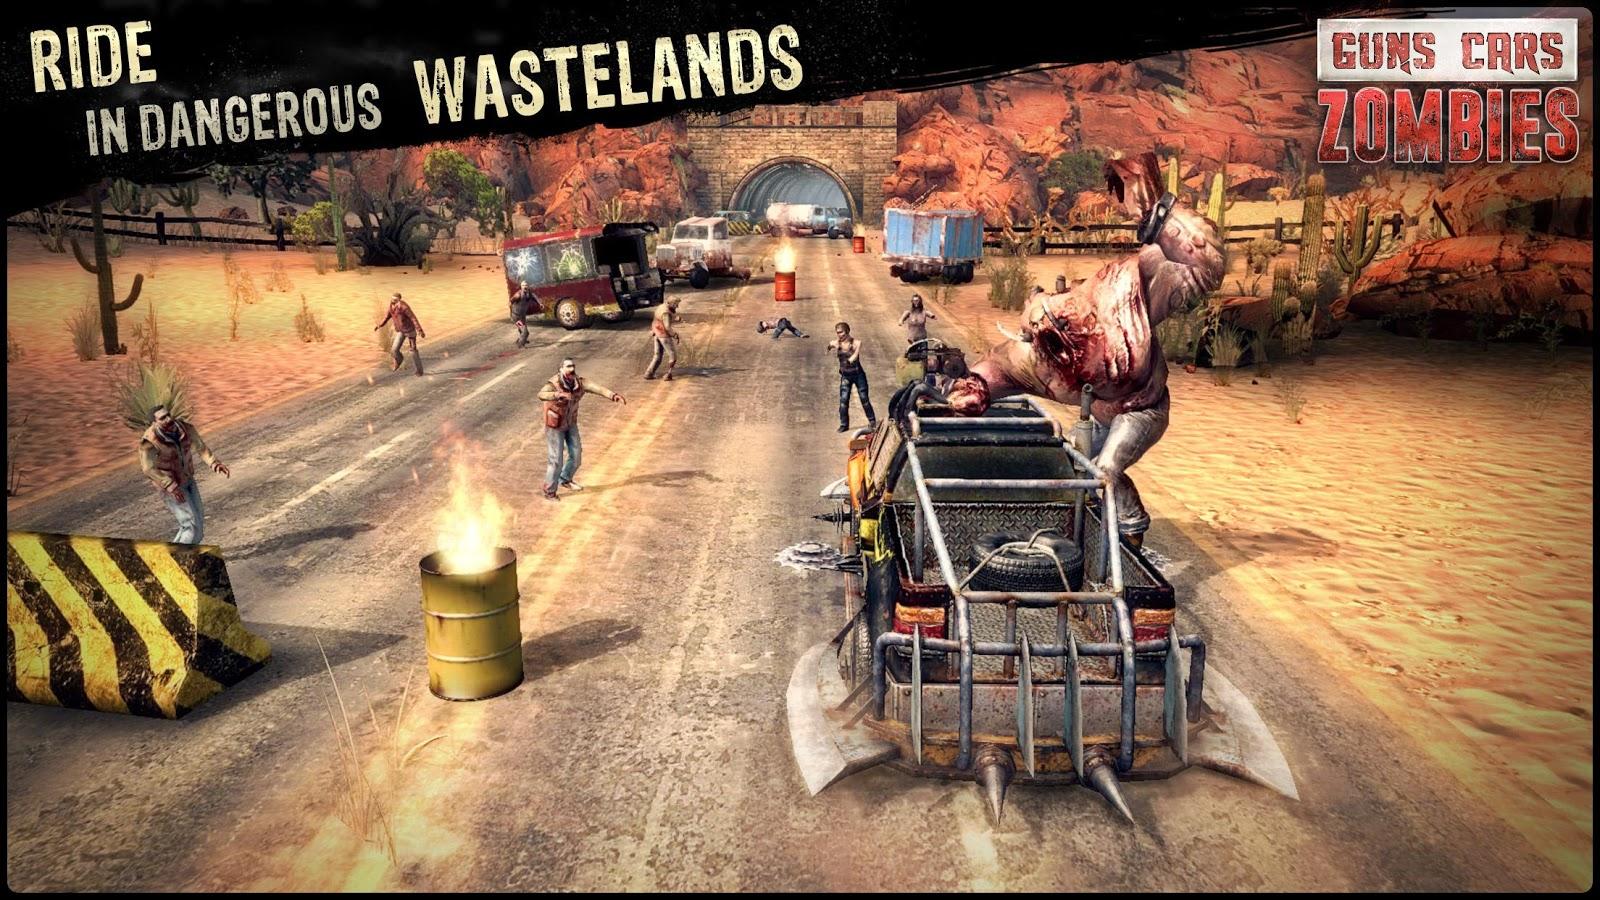 Guns cars and zombies screenshot